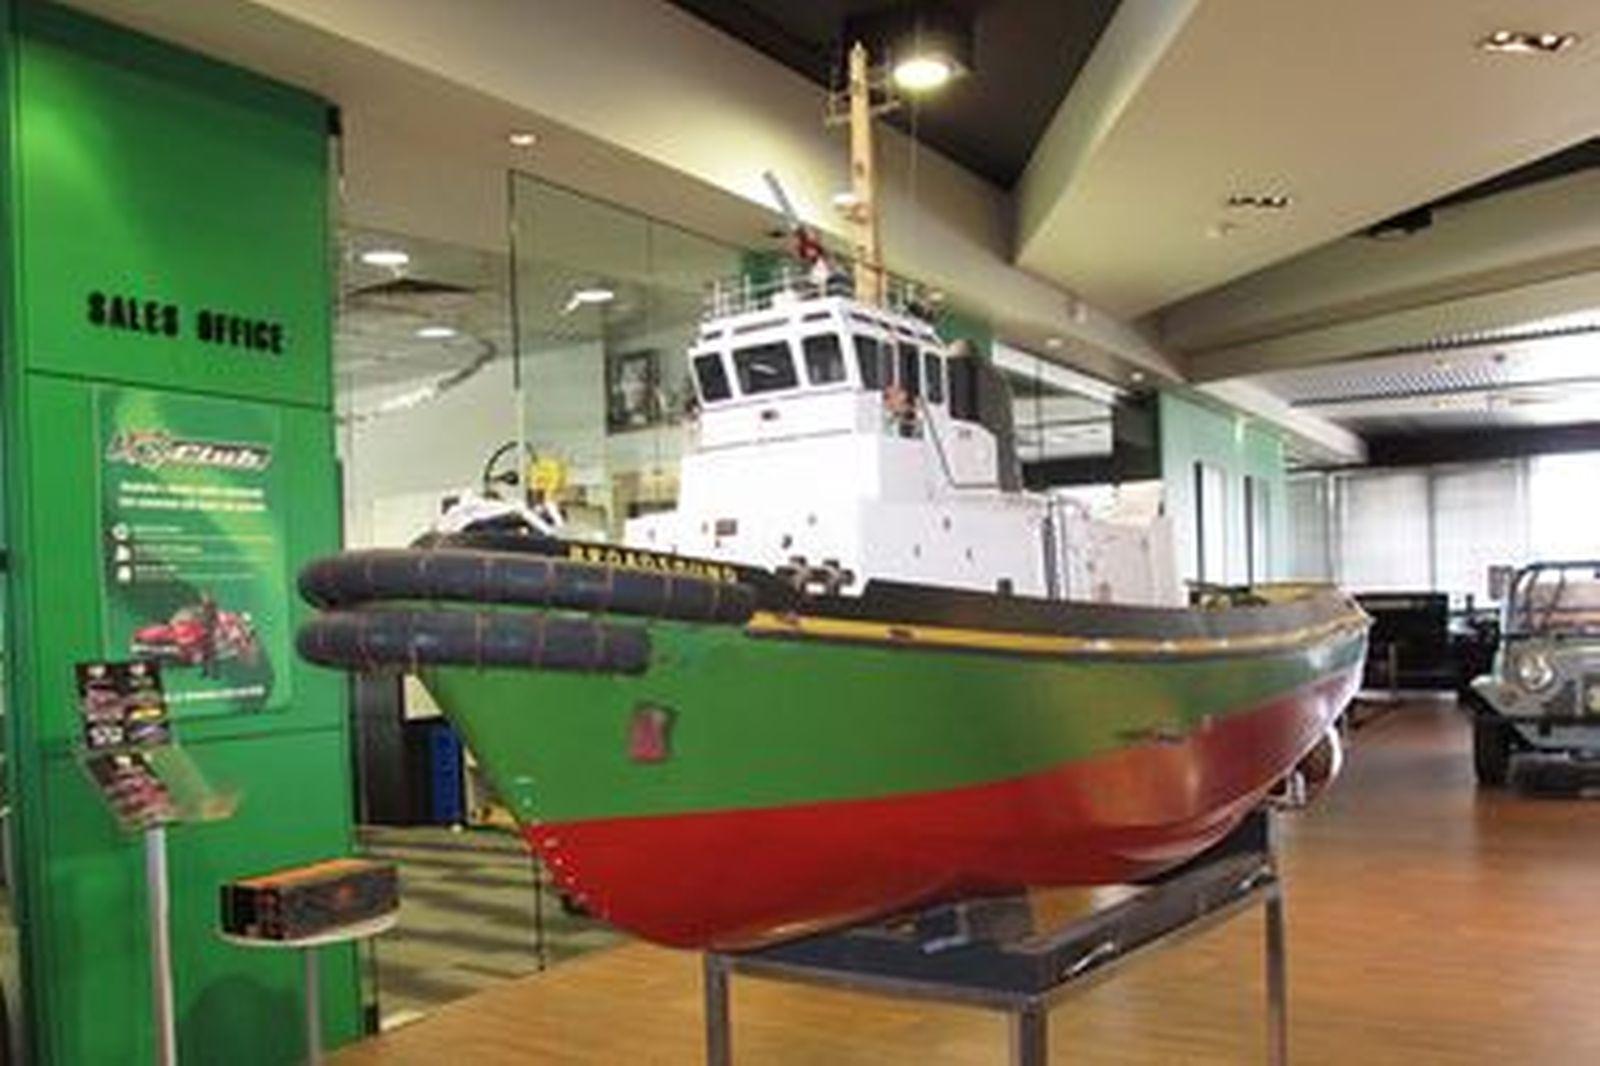 'Broadsound' Tugboat - 1 x Scratch-Built Radio-Controlled Timber Tugboat (2.2m x 70cm wide)